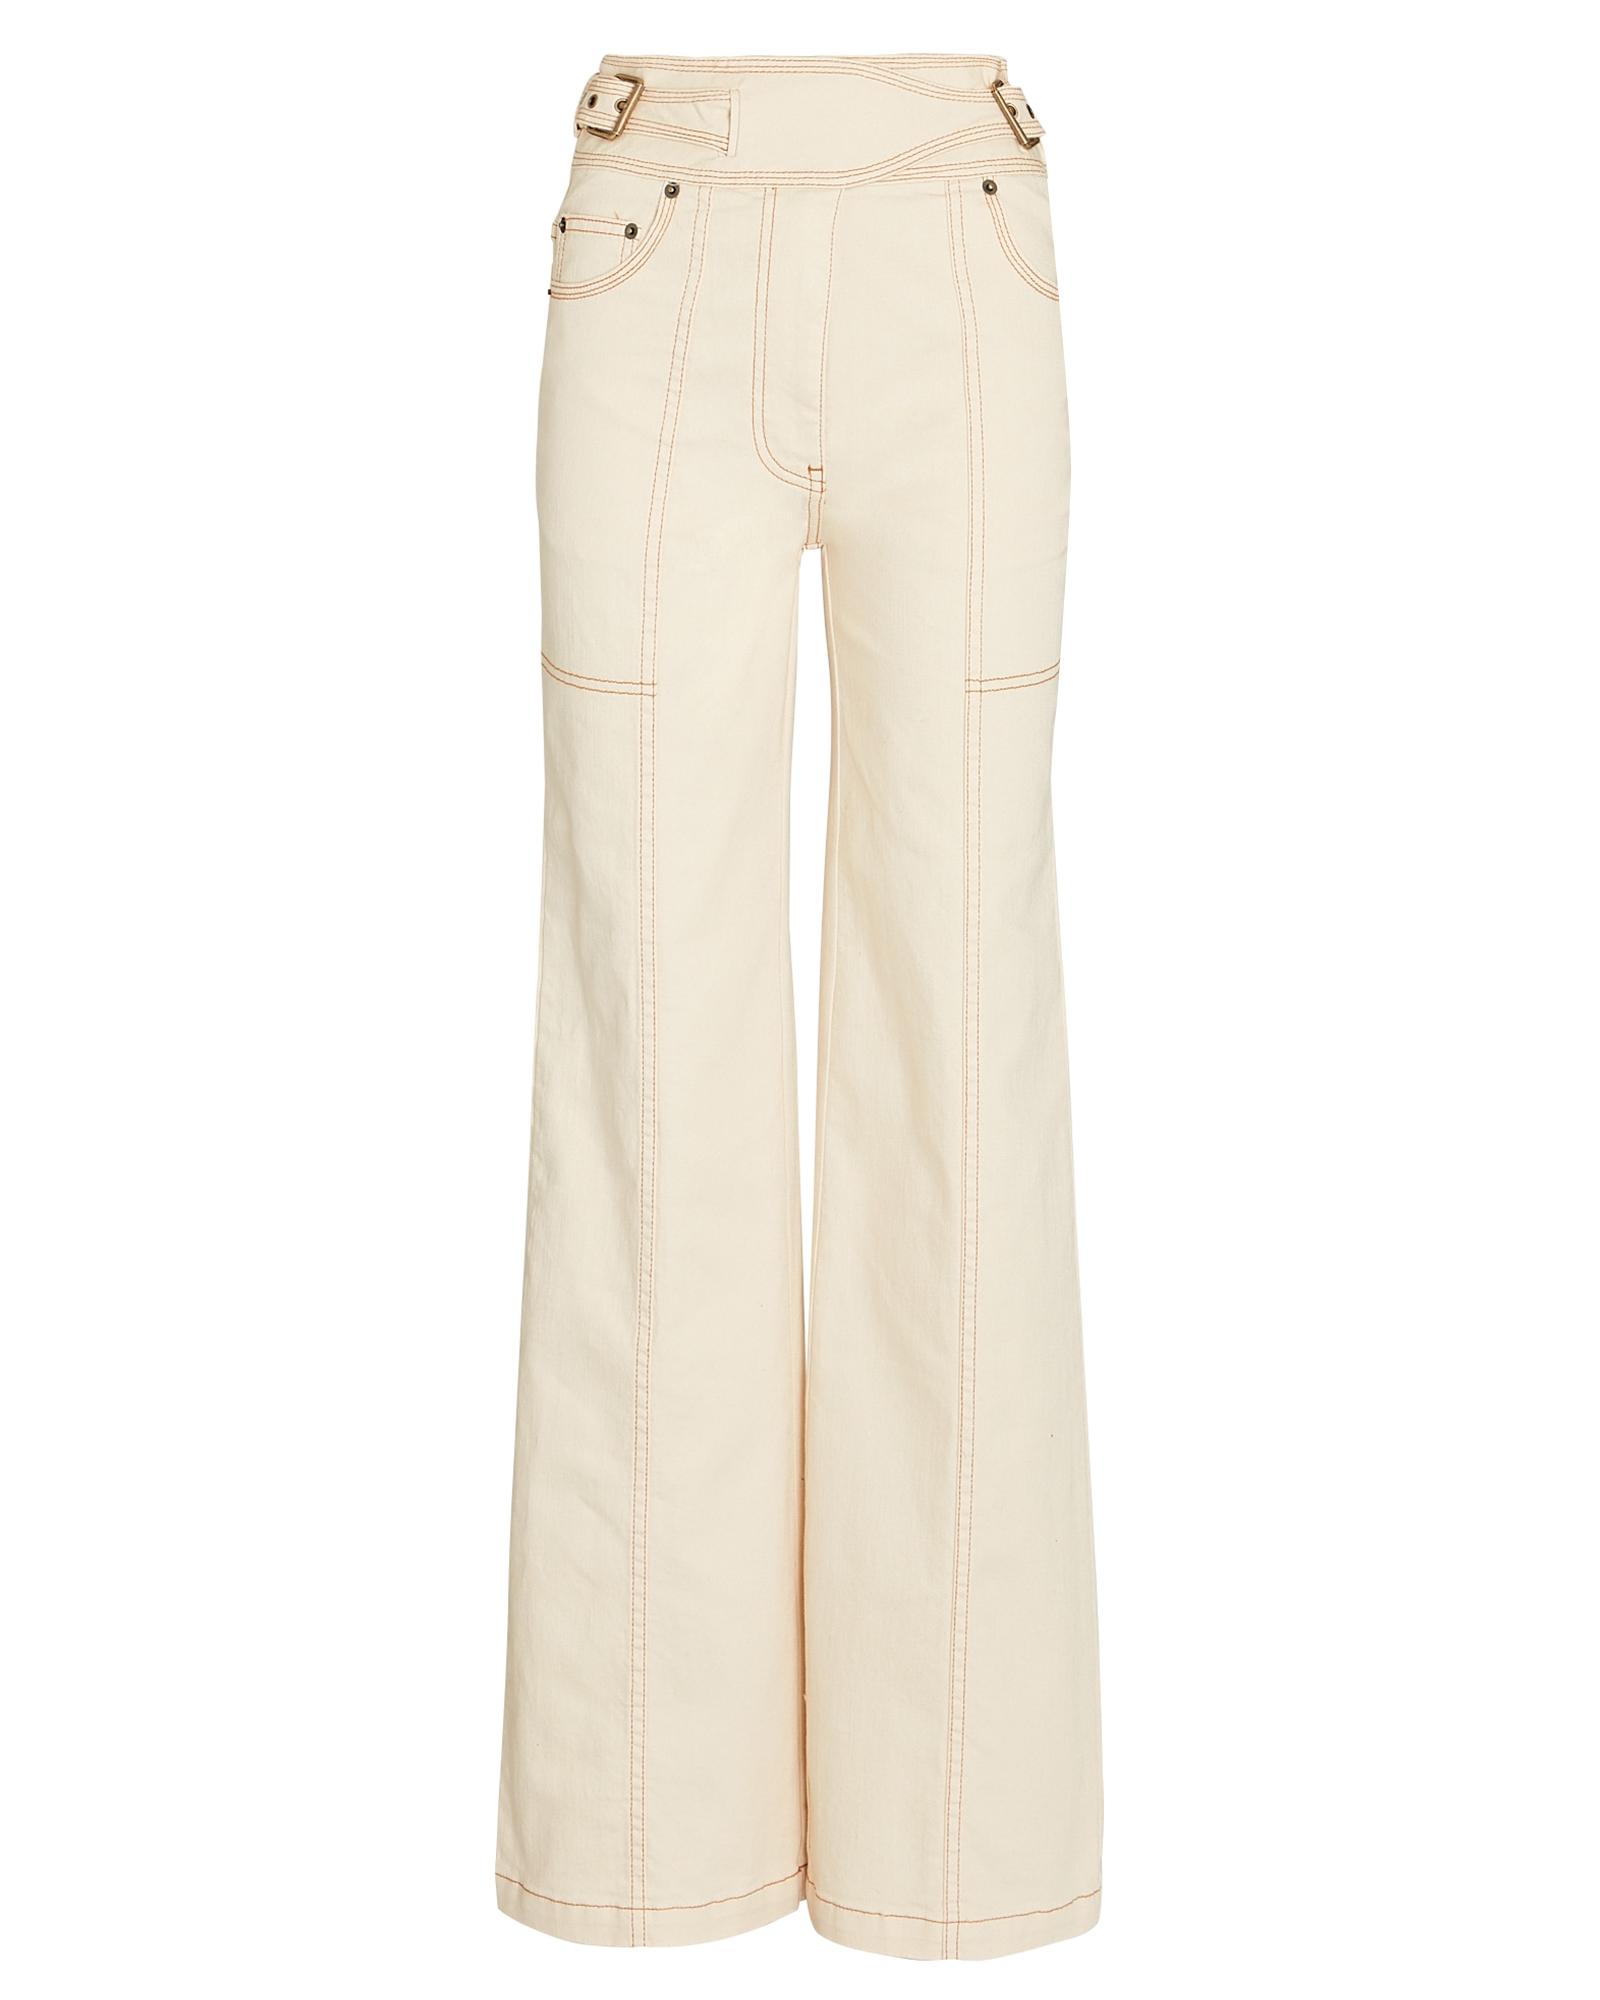 Ulla Johnson Albie Wide-Leg Jeans